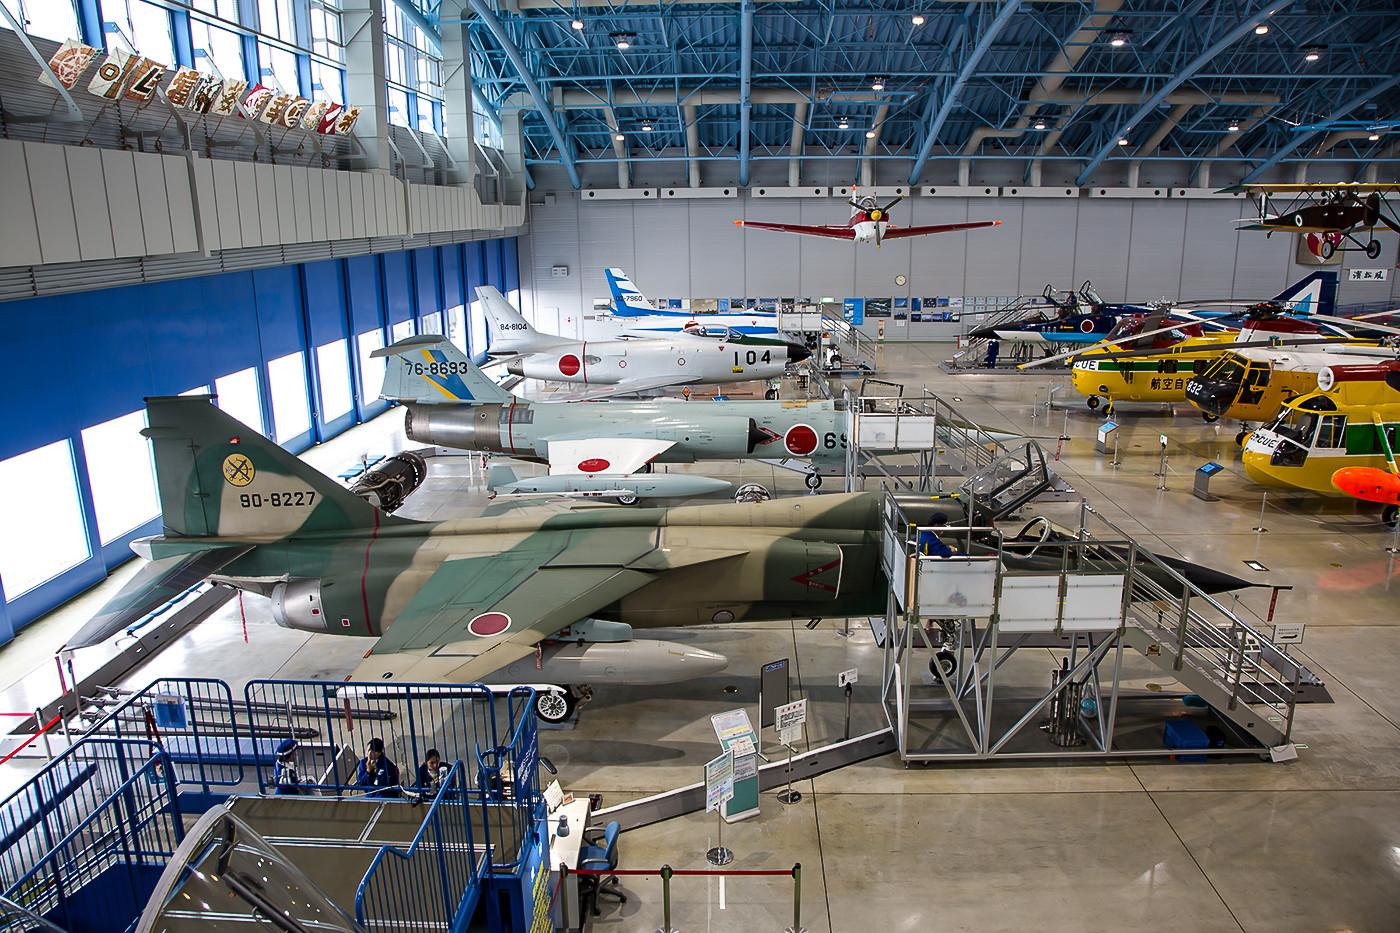 Der Hangar des Museums bietet tolle Maschinen. Rechtzeitiges Erscheinen sichert auch gute Motive, bevor Heerscharen an Schulkindern einfallen.